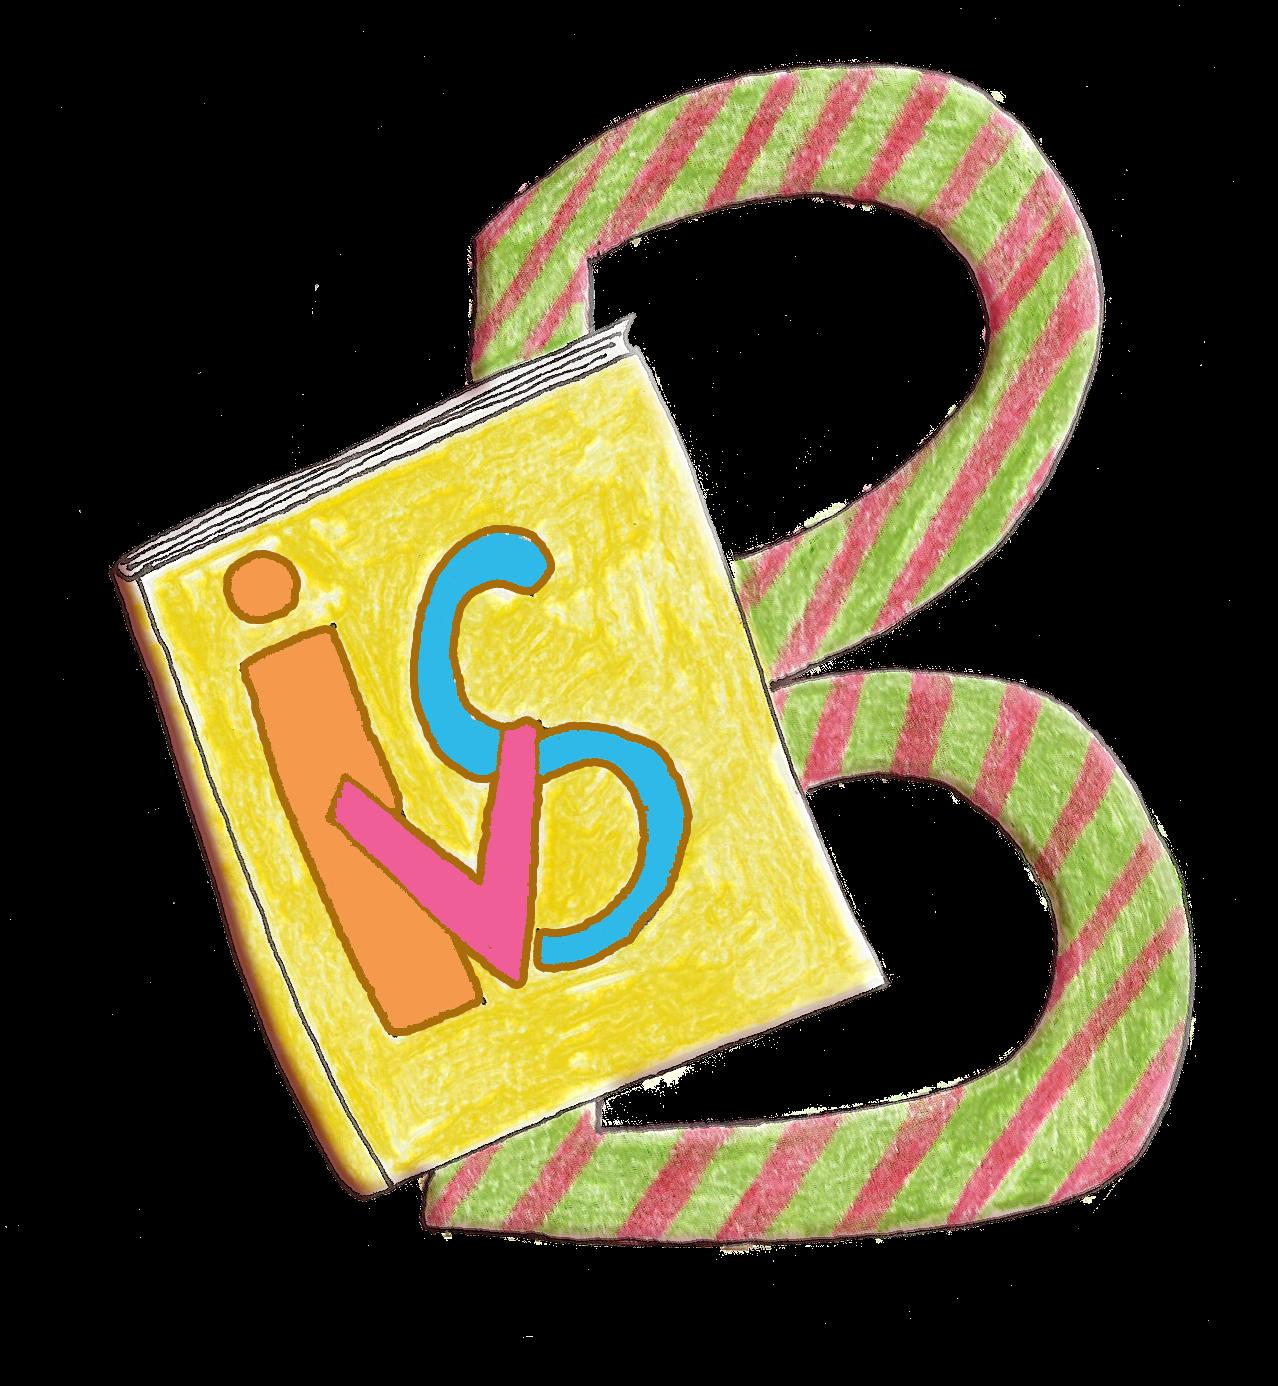 La biblioteca logotipo de la biblioteca versi n definitiva for Logotipos de bibliotecas